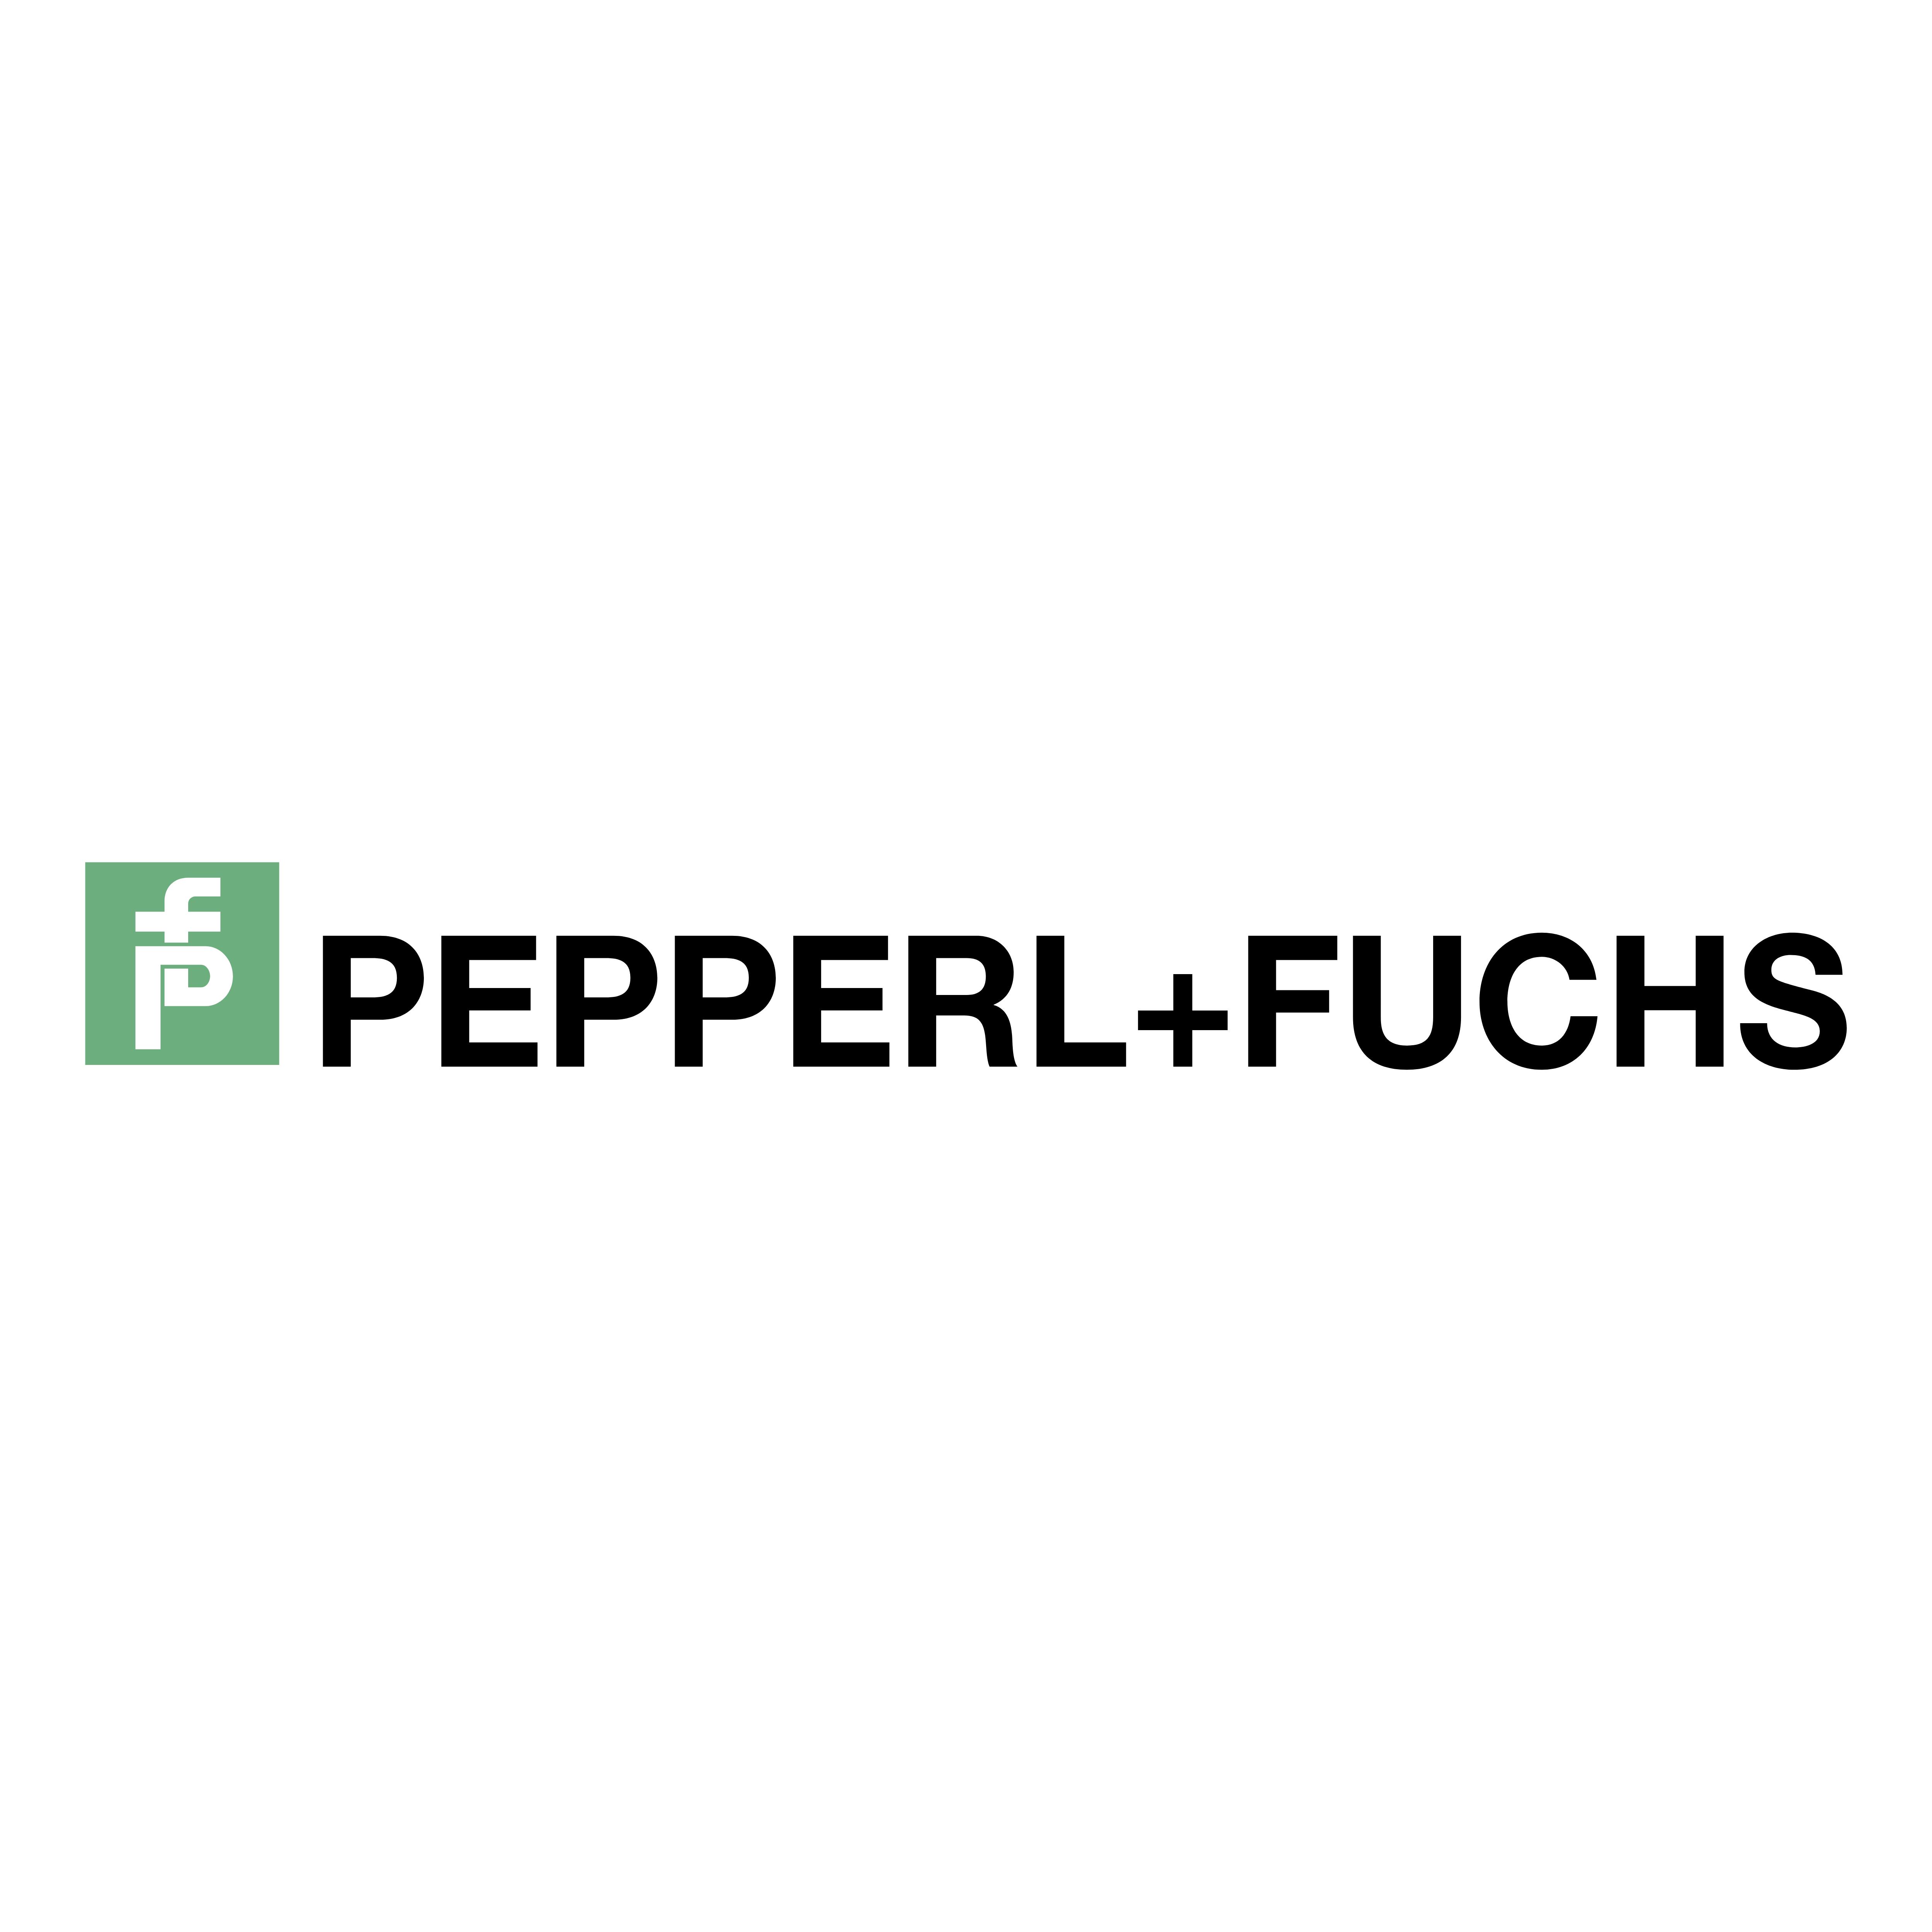 Pepperl Fuchs Logos Download